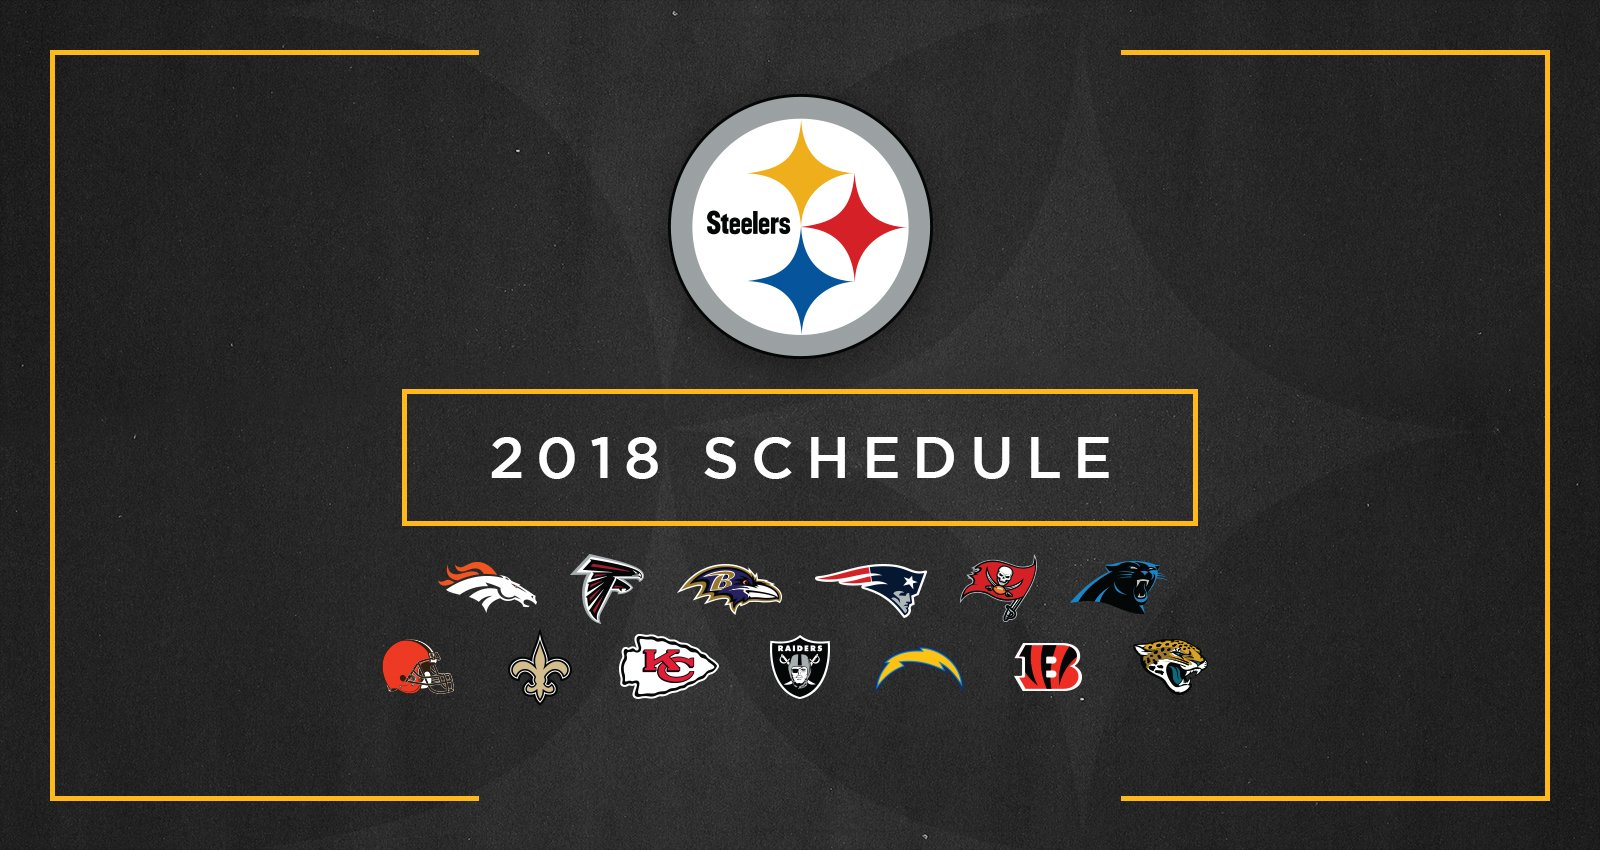 Our 2018 regular season schedule has been announced. #ScheduleRelease2018  SCHEDULE: https://t.co/D3K1FV353T https://t.co/ZAk2eMgpM3